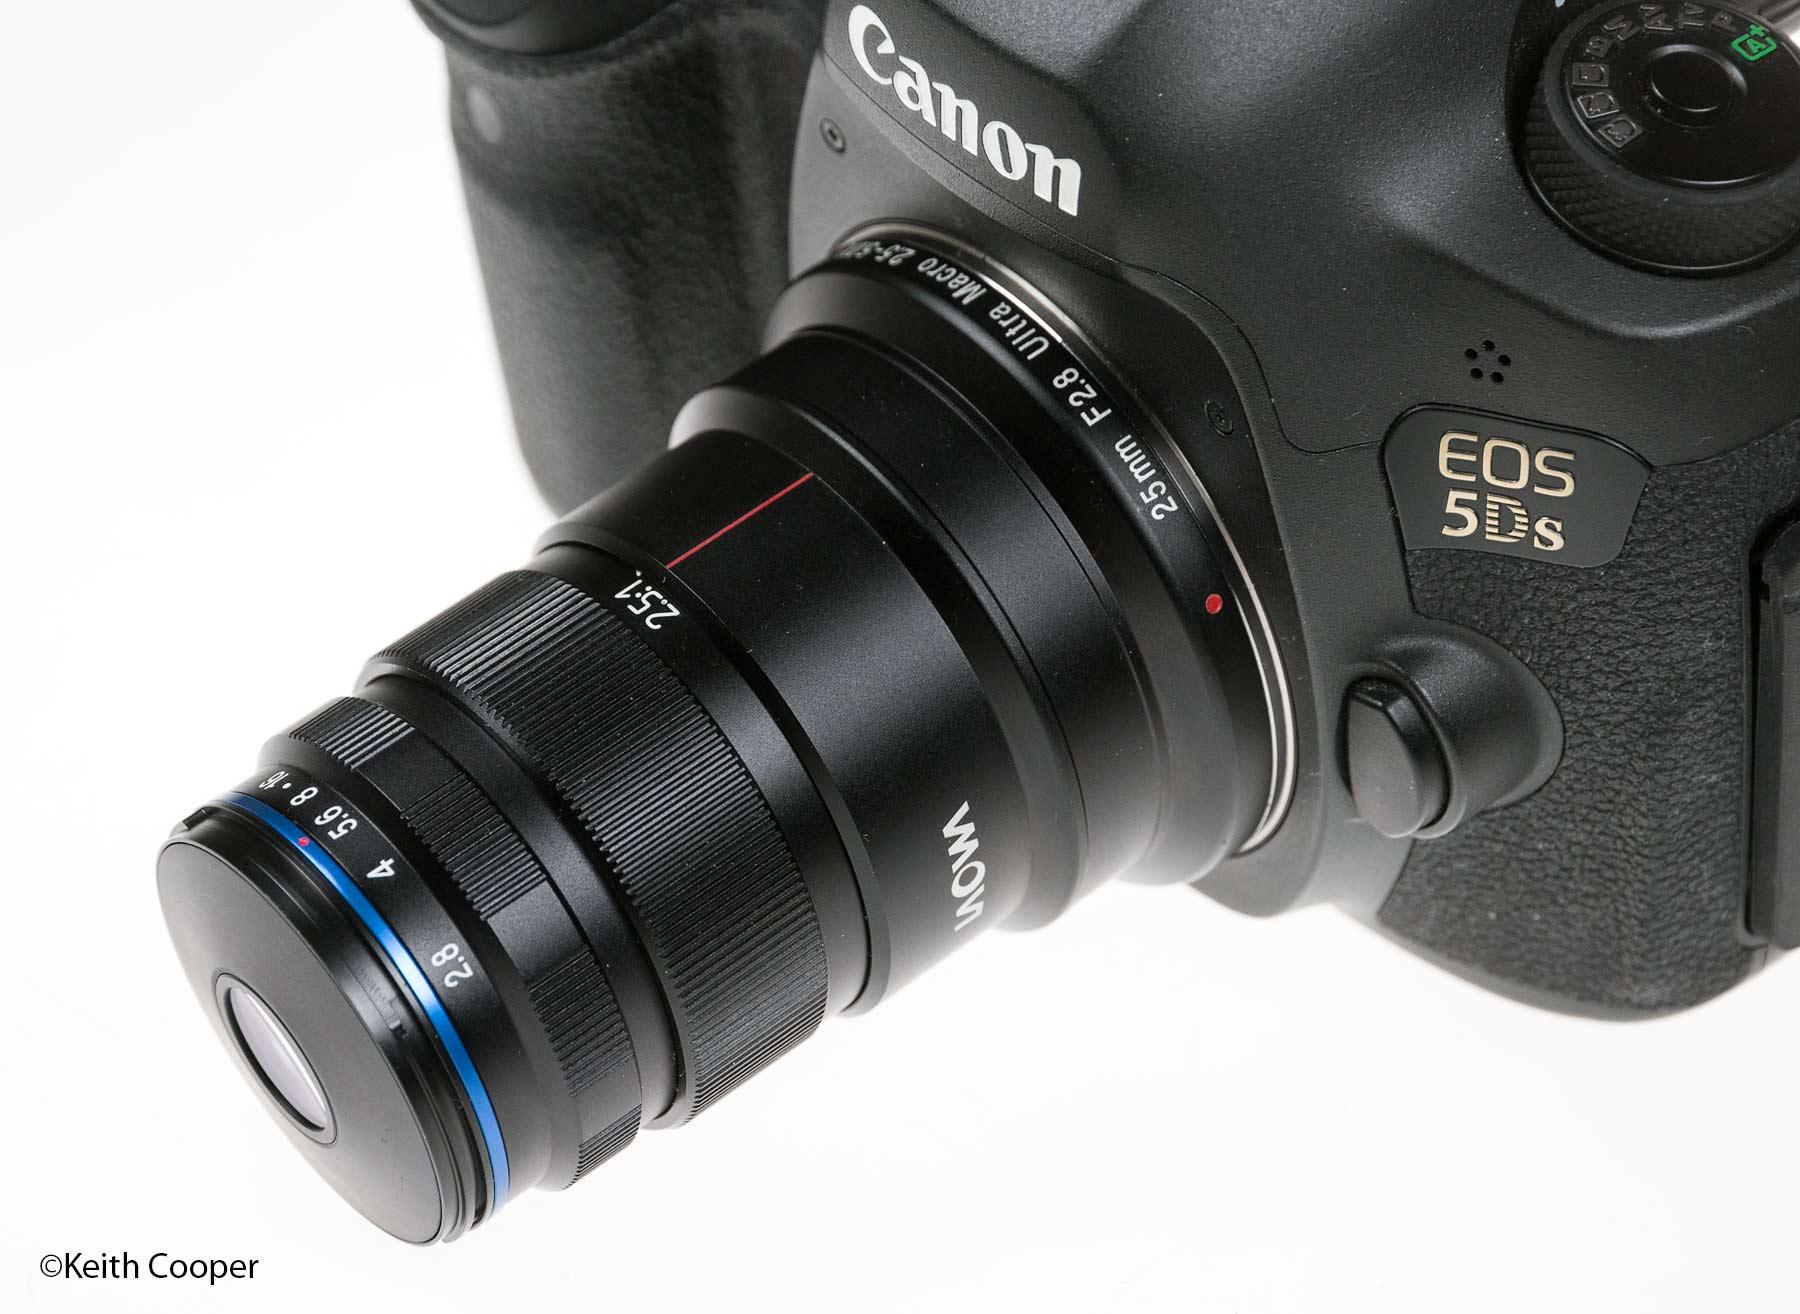 Laowa 25mm f/2.8 2.5x - 5x Ultra Macro lens review